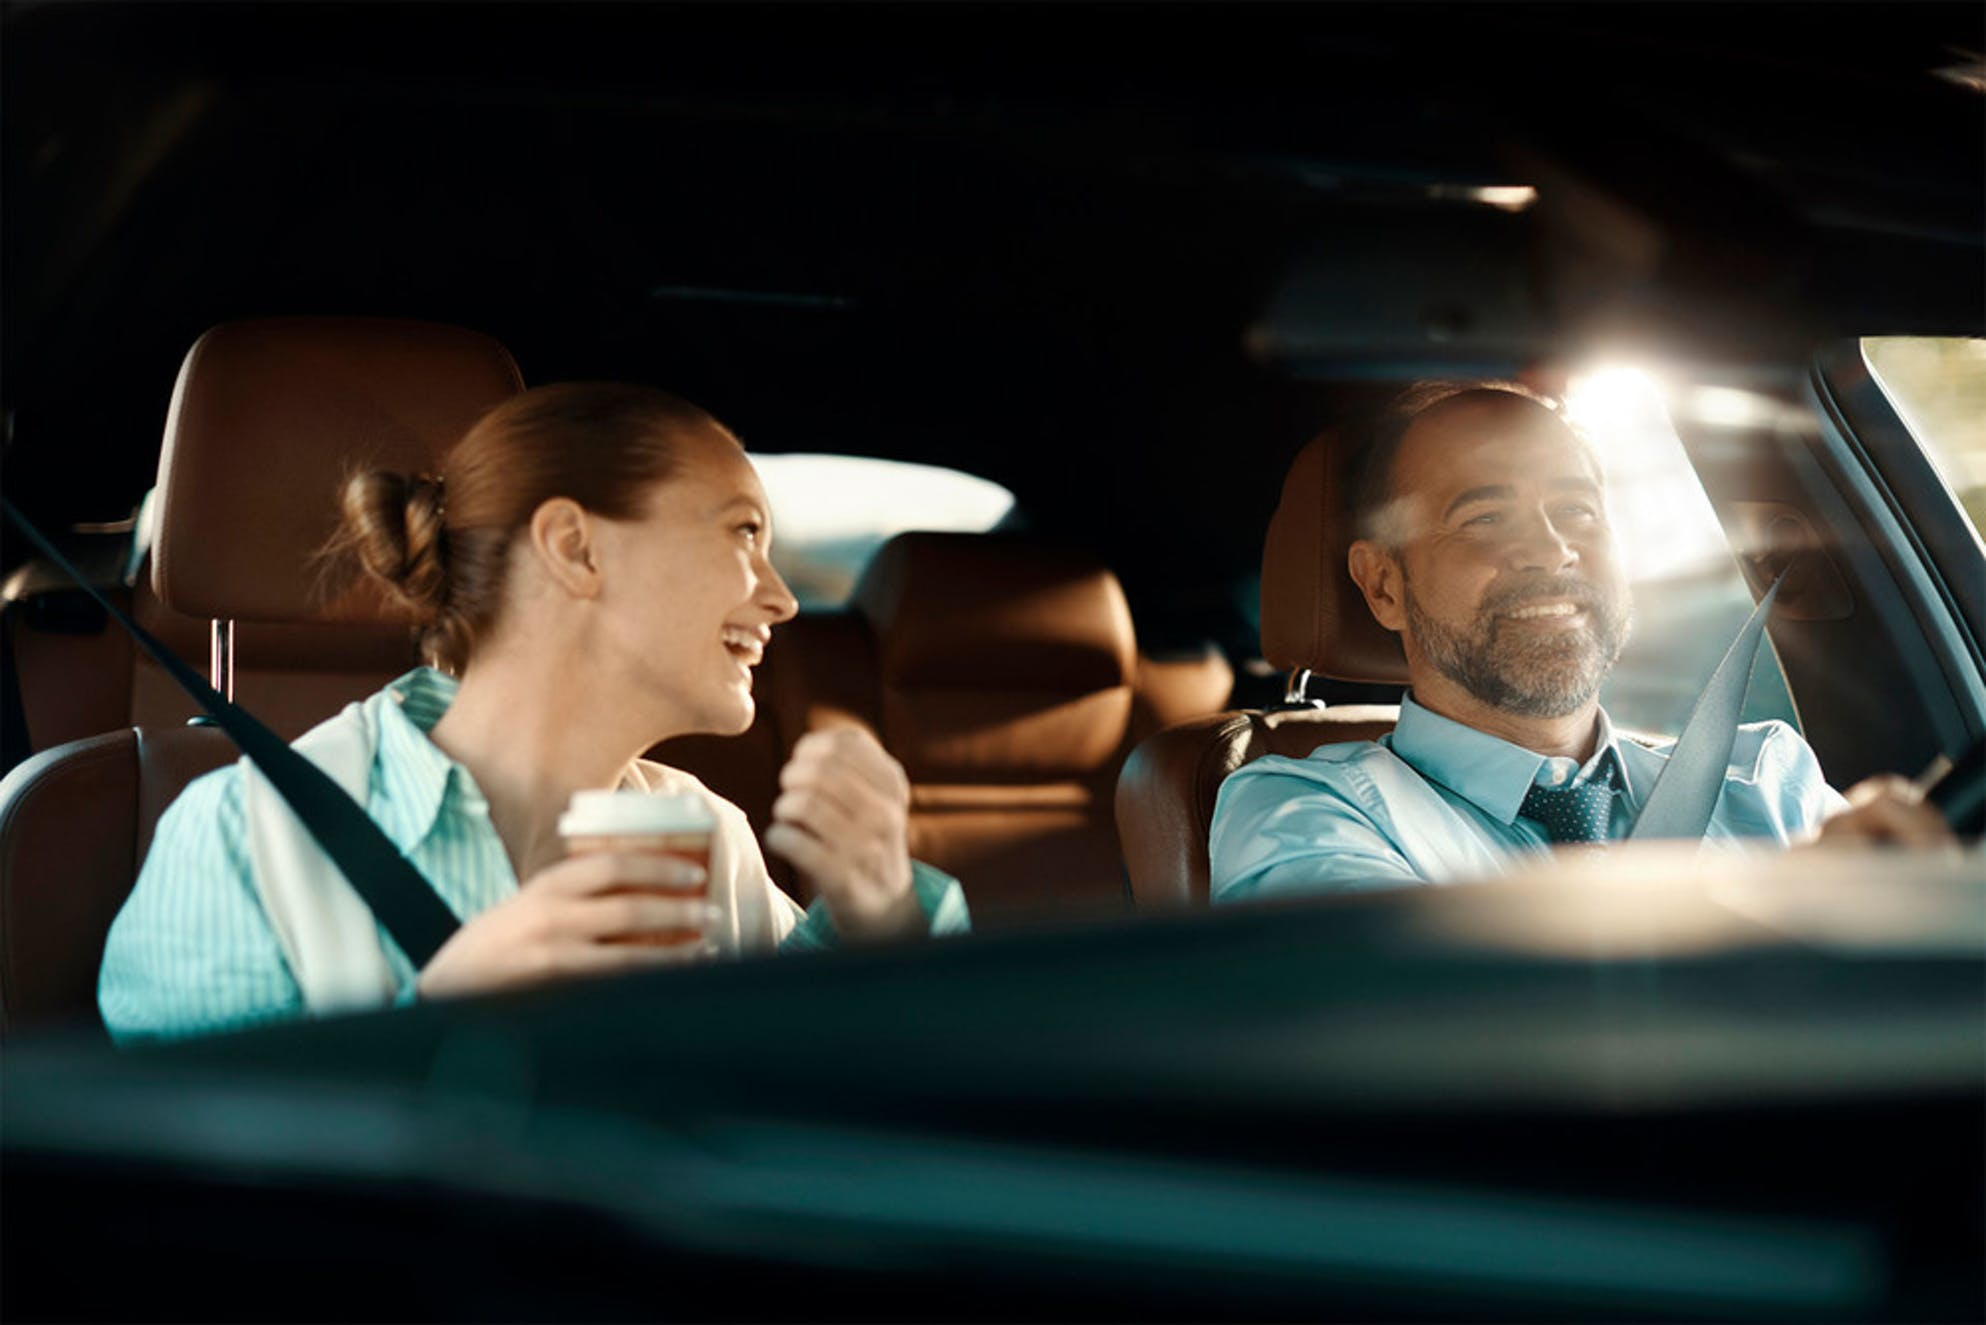 Carpooling to save money on gas